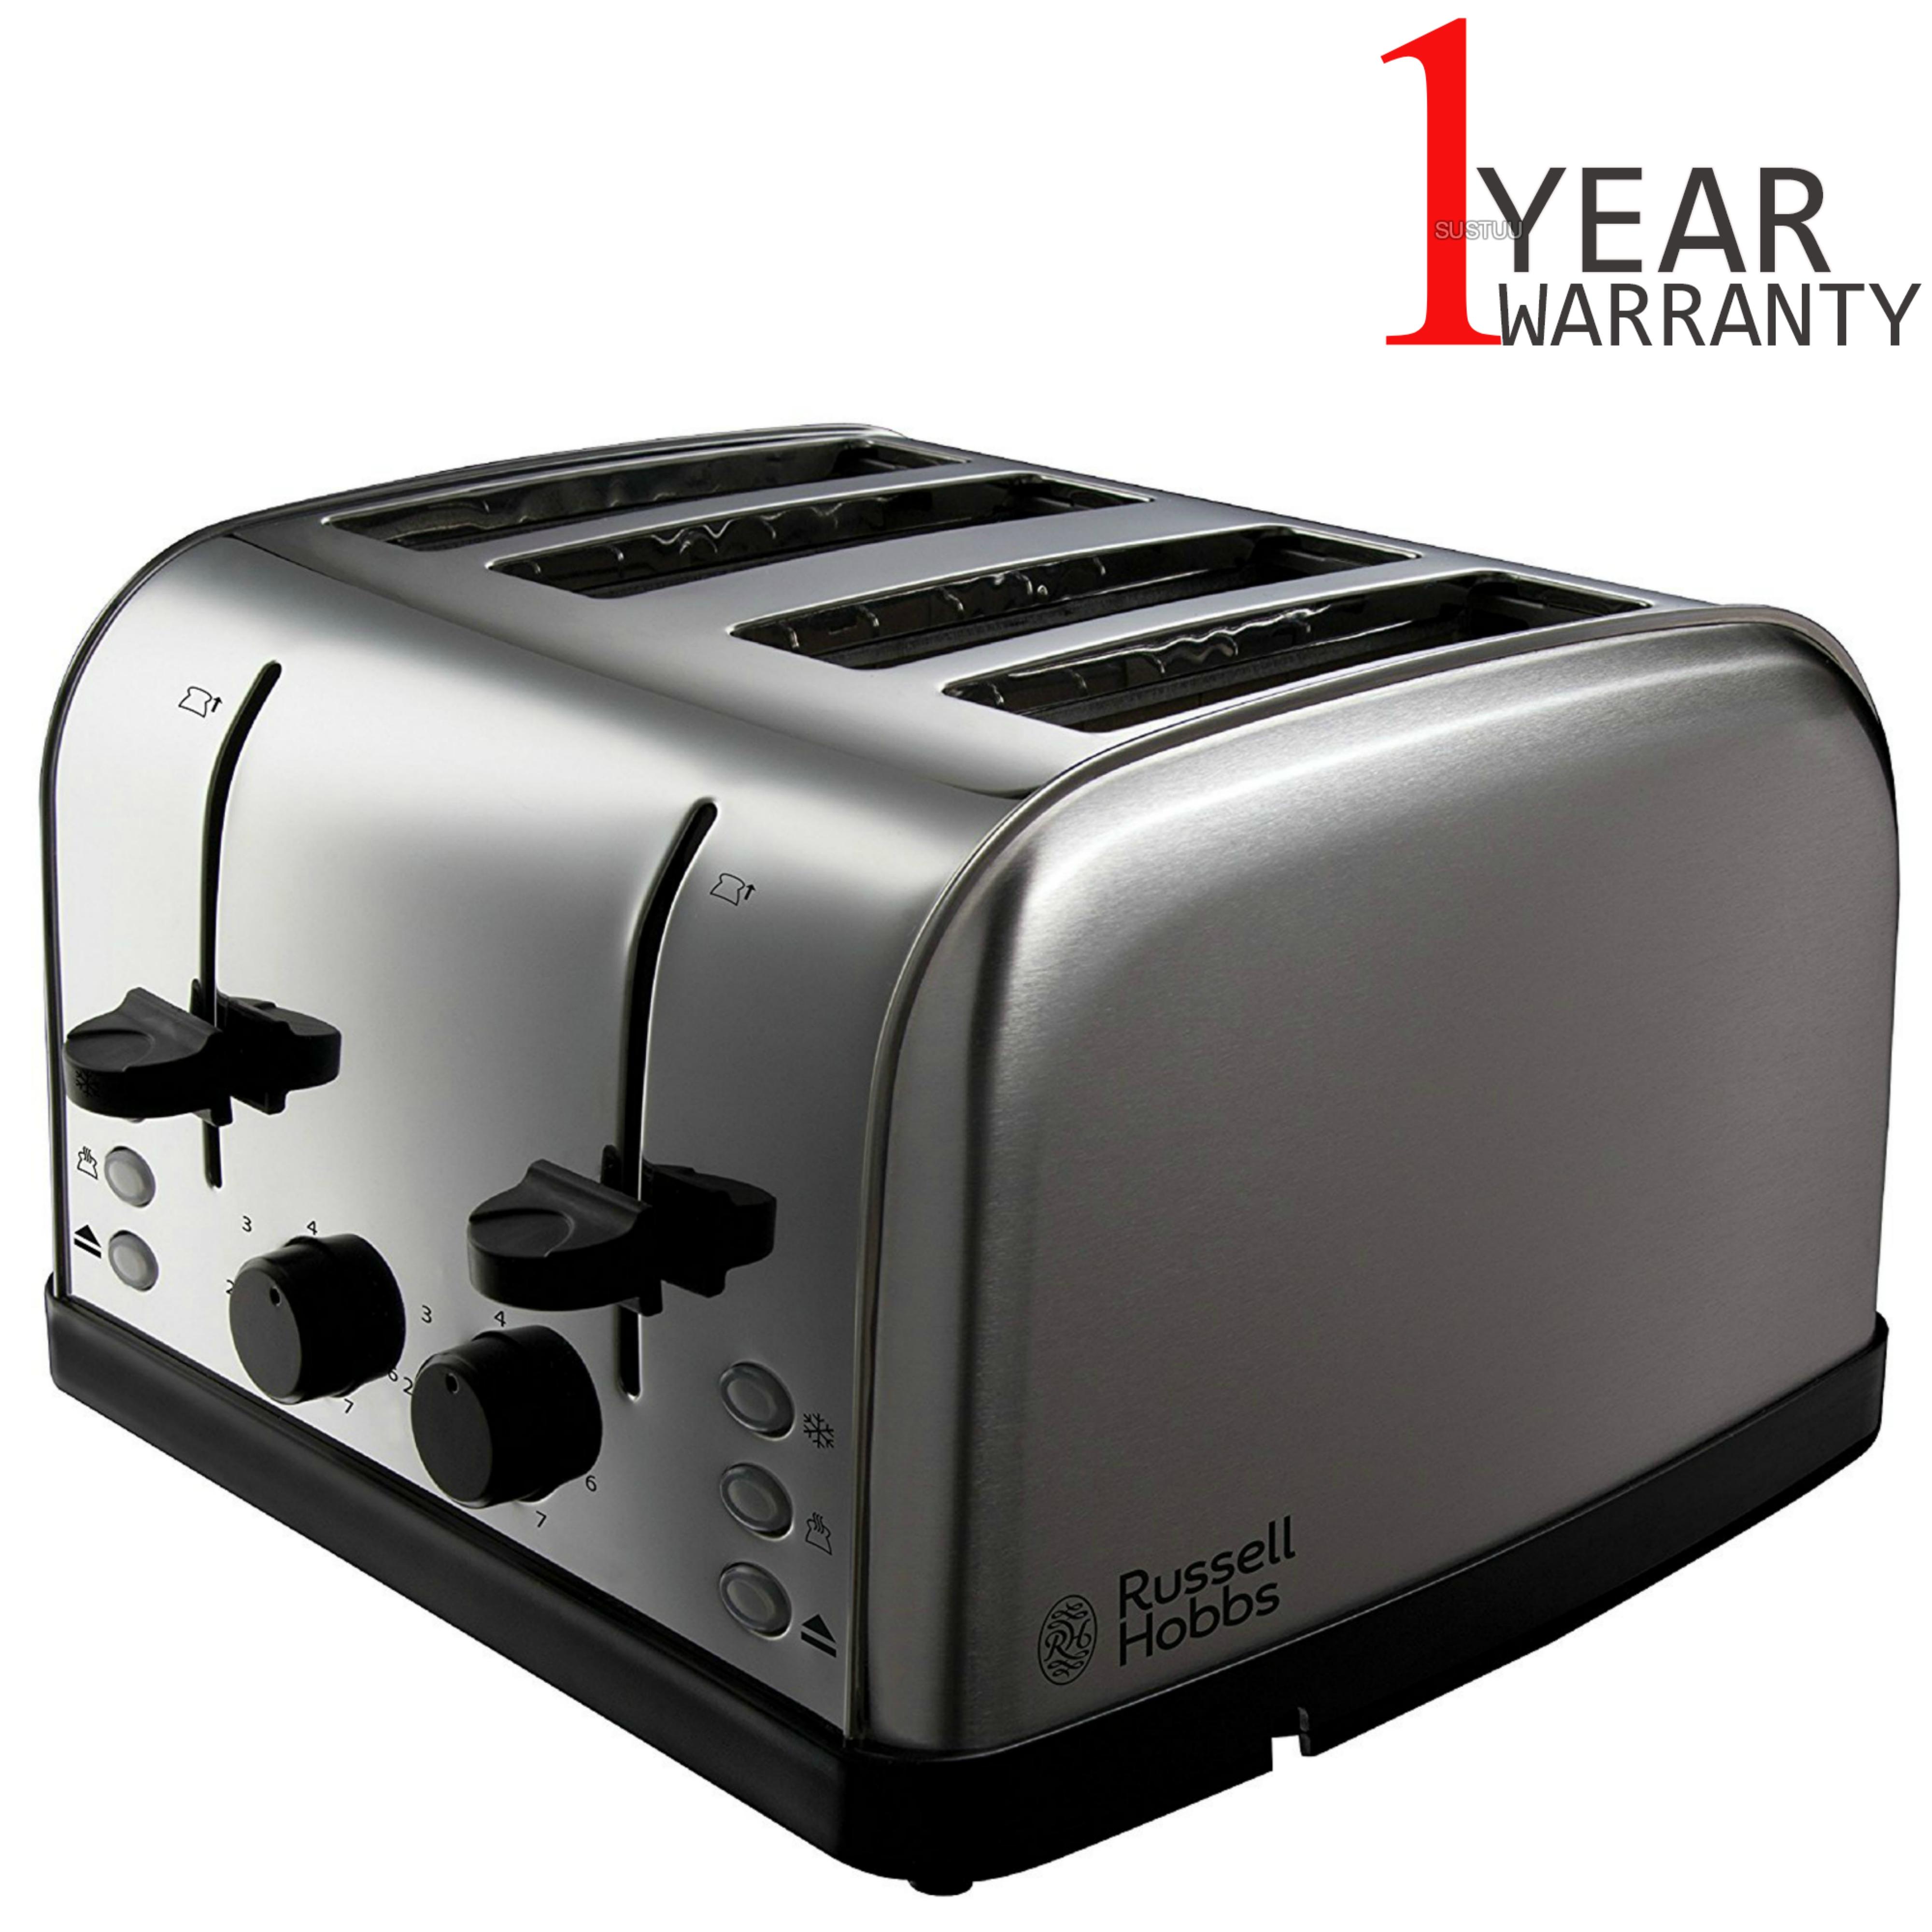 Russell Hobbs 18790 4-Slice Futura Toaster   Frozen Bread Function   Stainless Steel